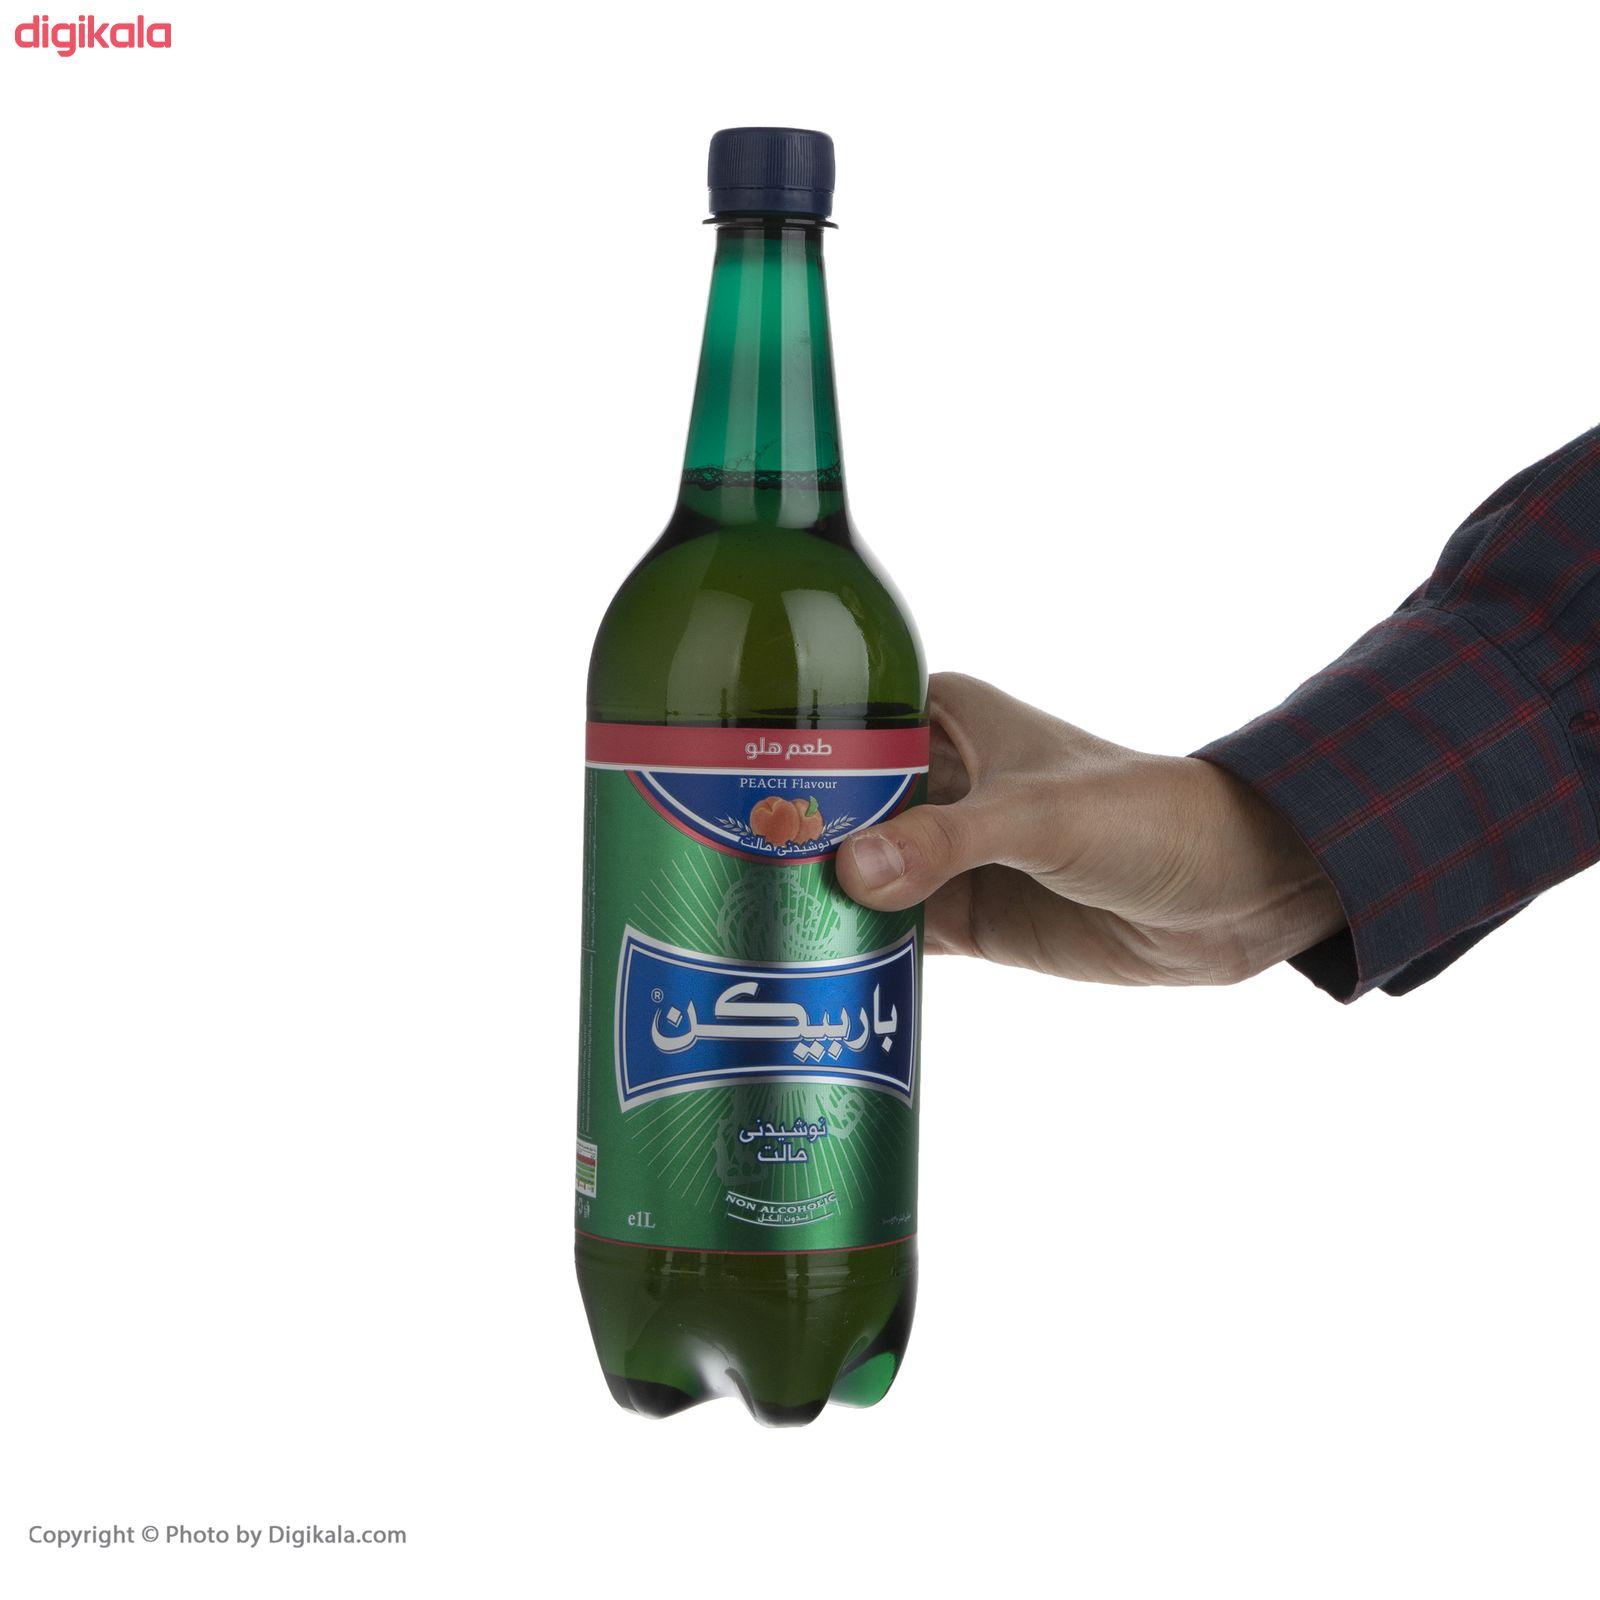 نوشیدنی مالت باربیکن طعم هلو - 1 لیتر main 1 2